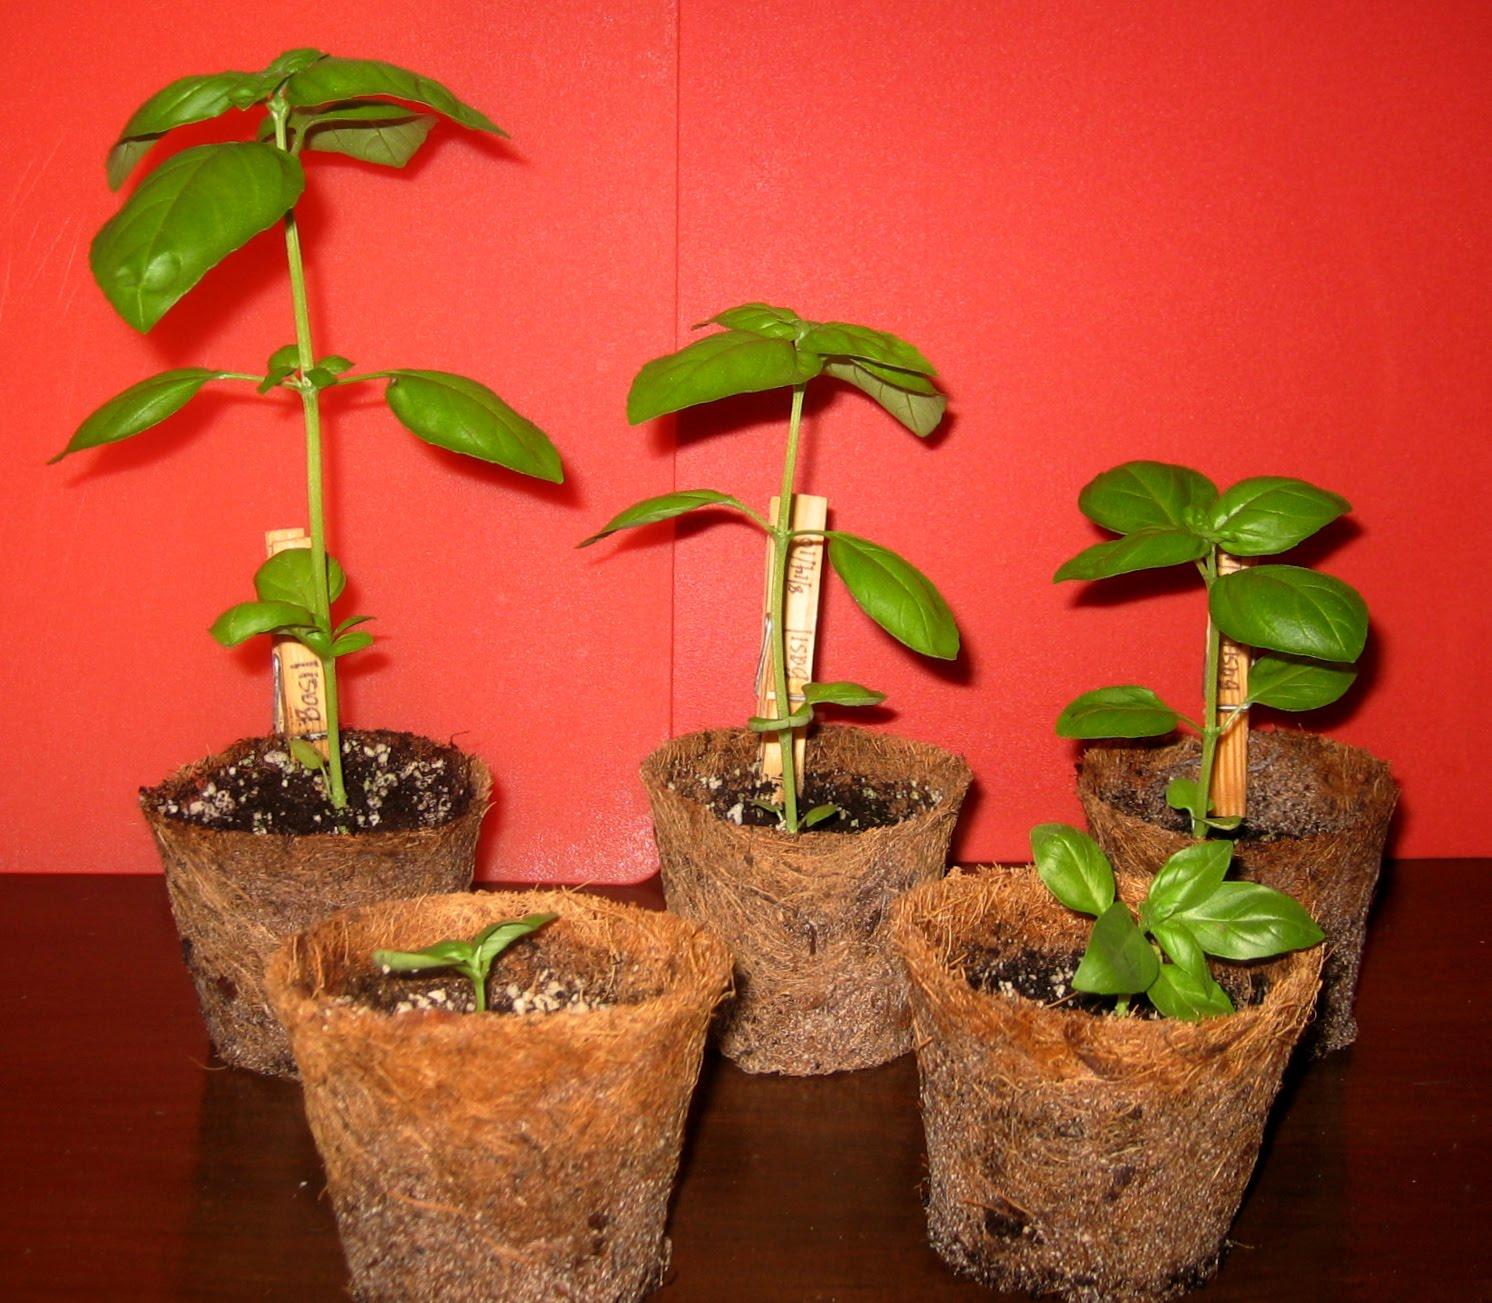 Led indoor gardening led grow light vs natural for Indoor gardening led